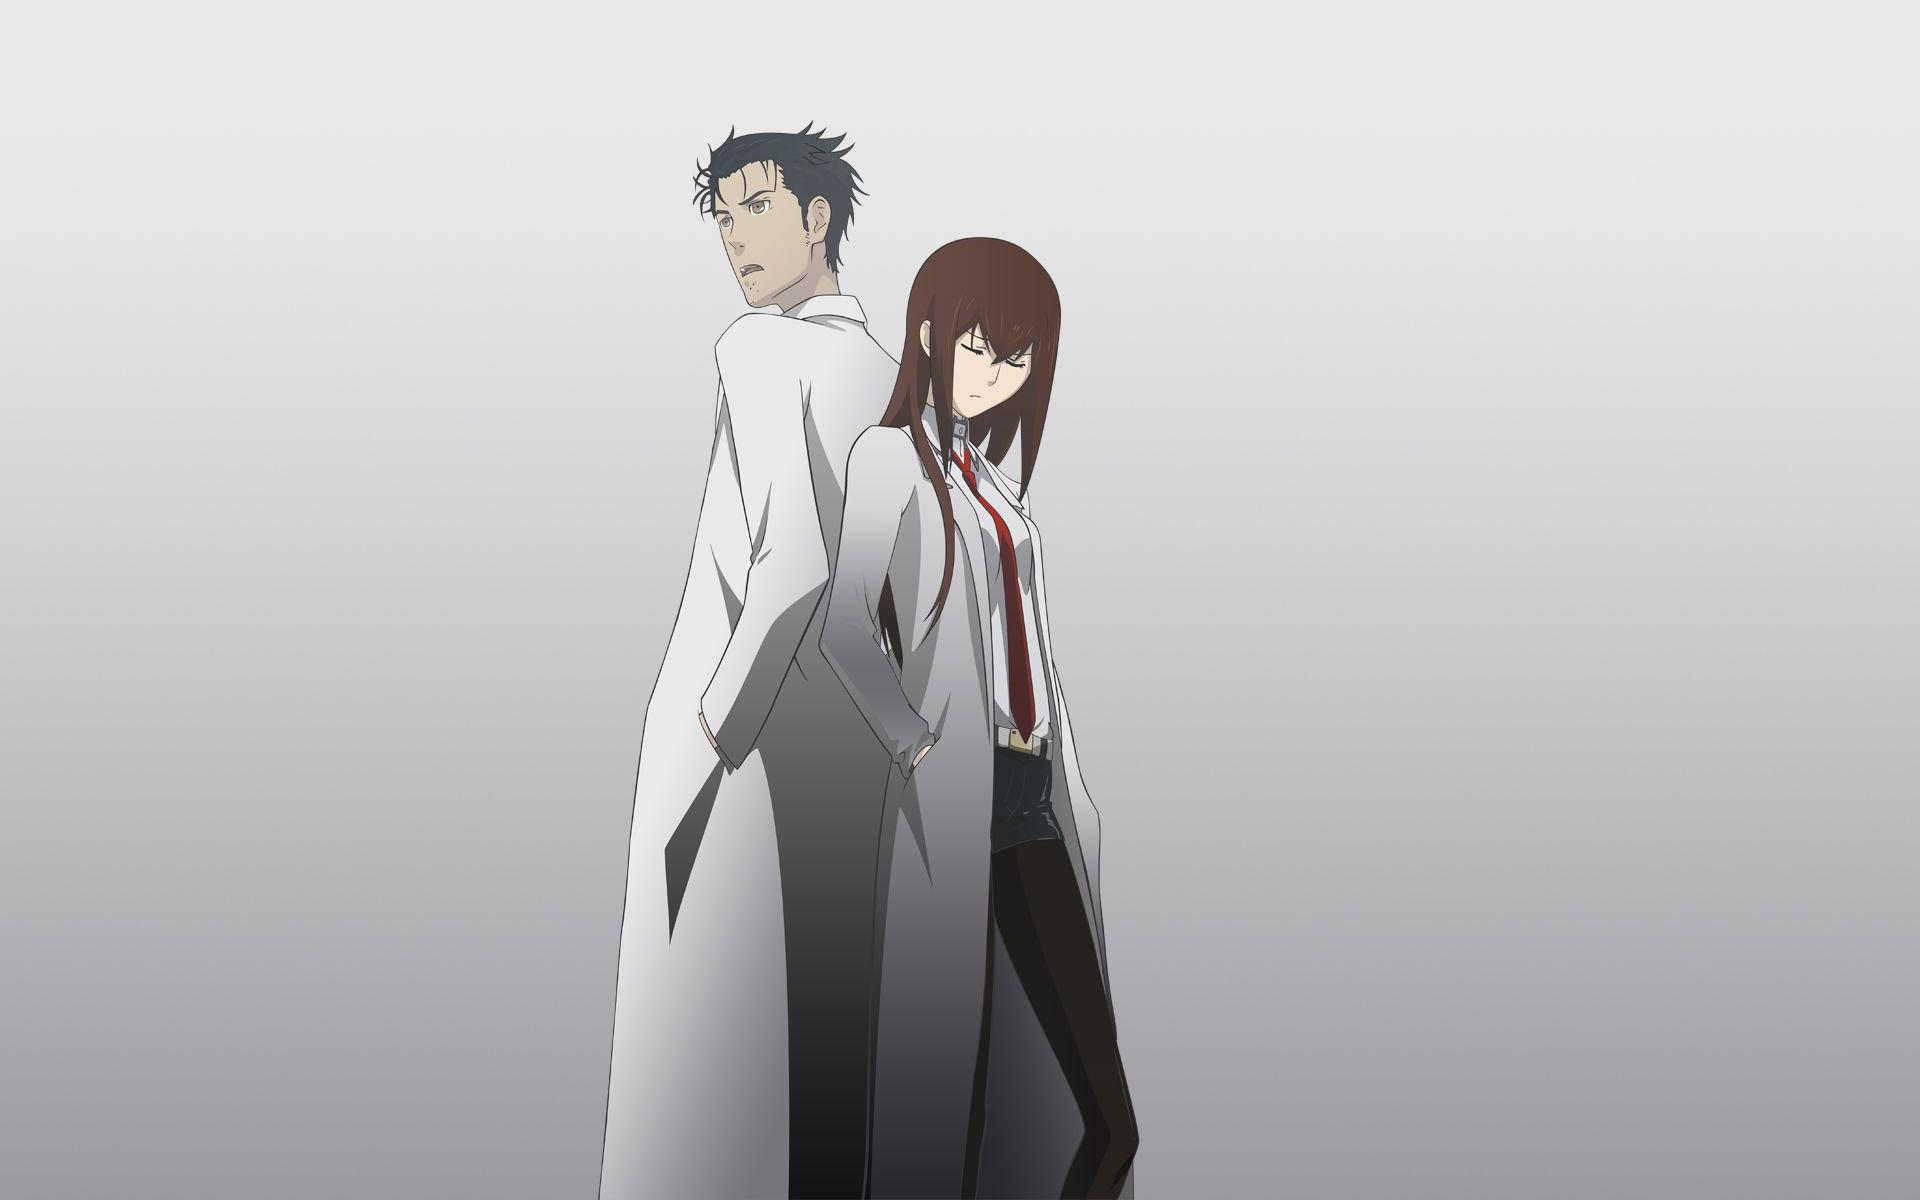 Okabe Steins Gate 17 Hd Wallpaper - Animewp.com